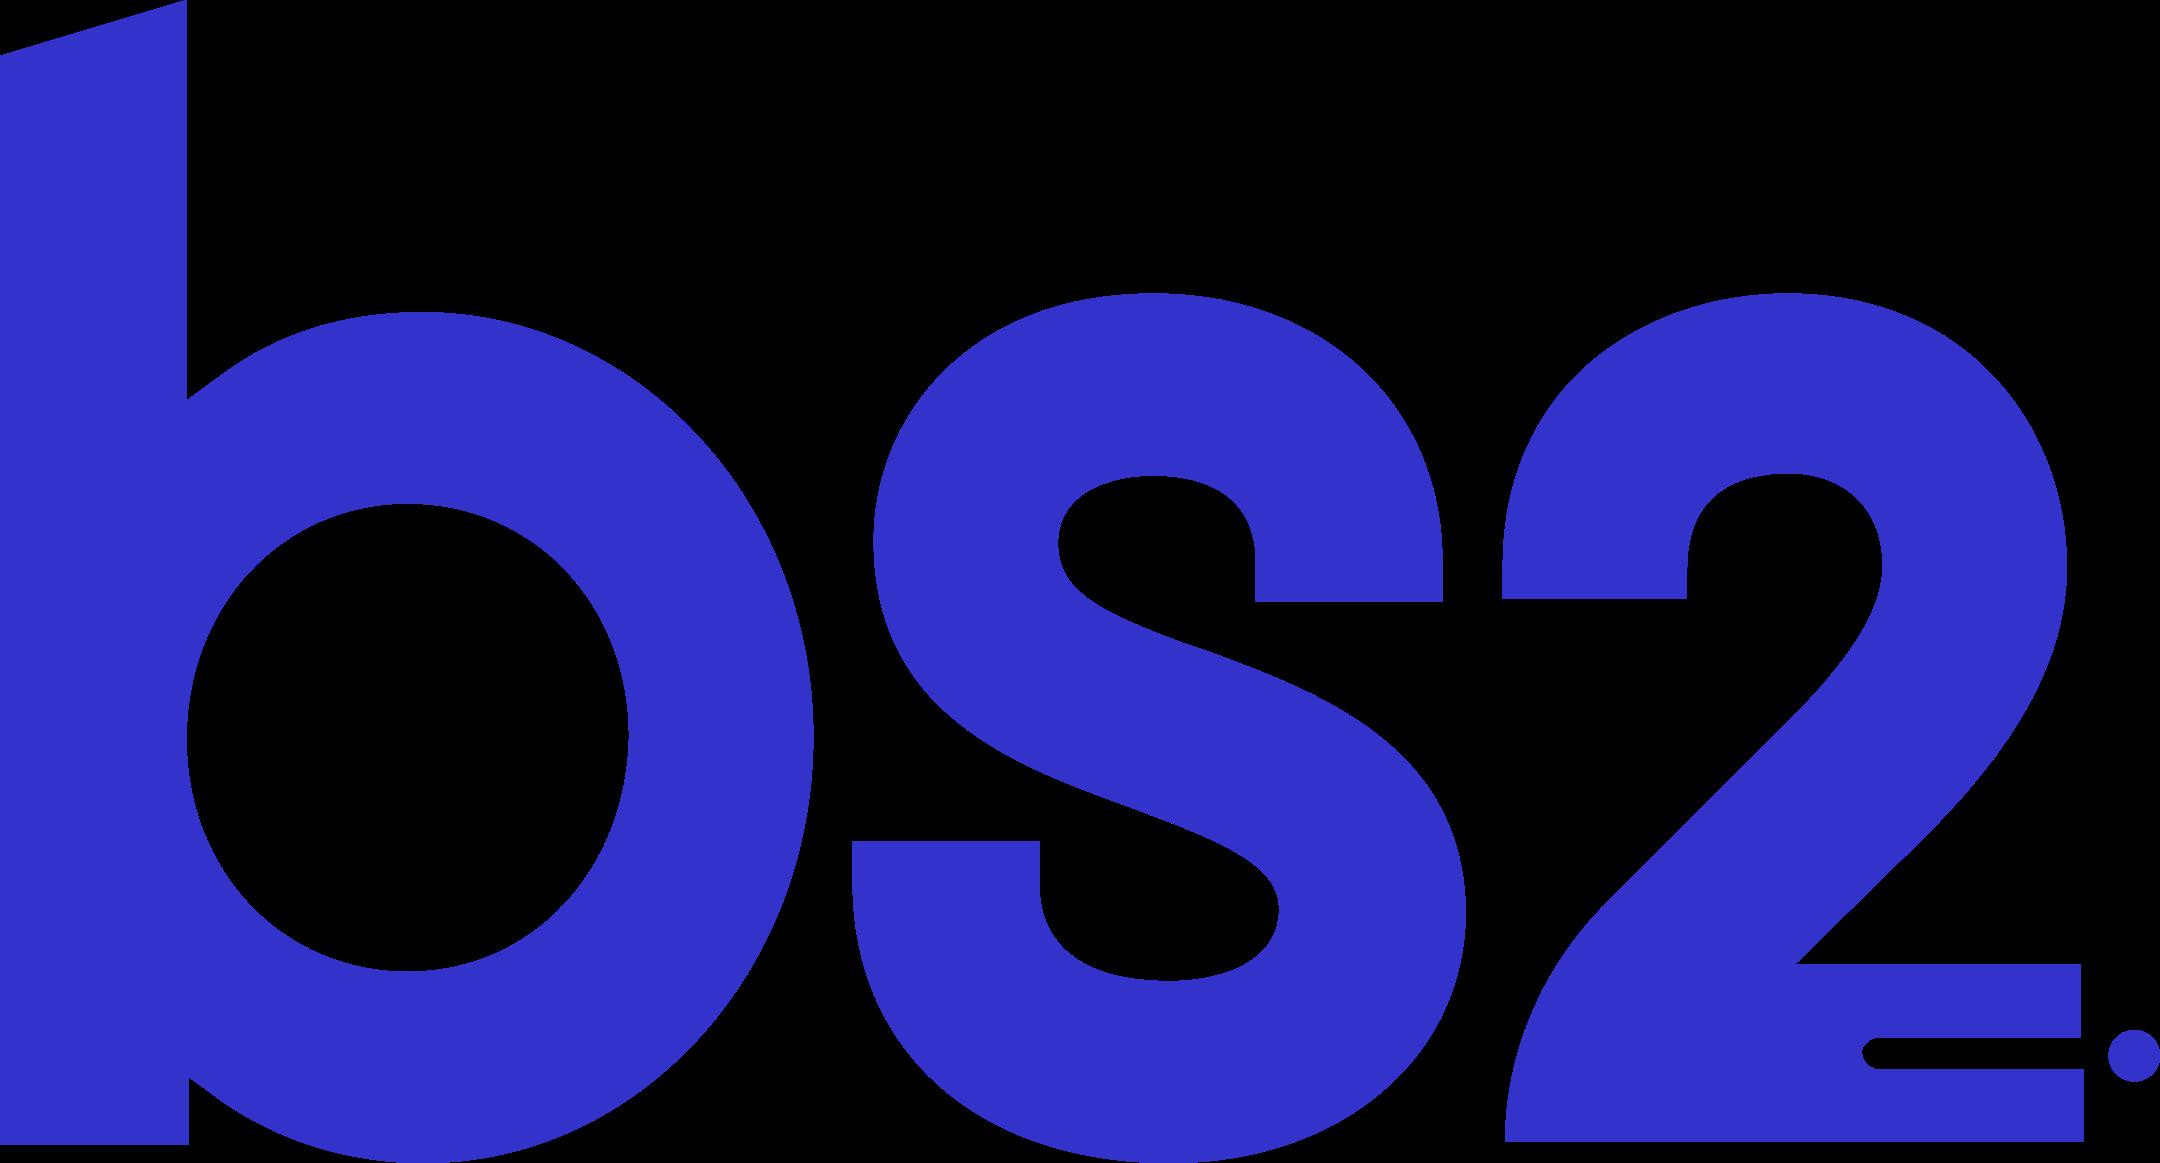 banco bs2 logo 1 - Banco BS2 Logo